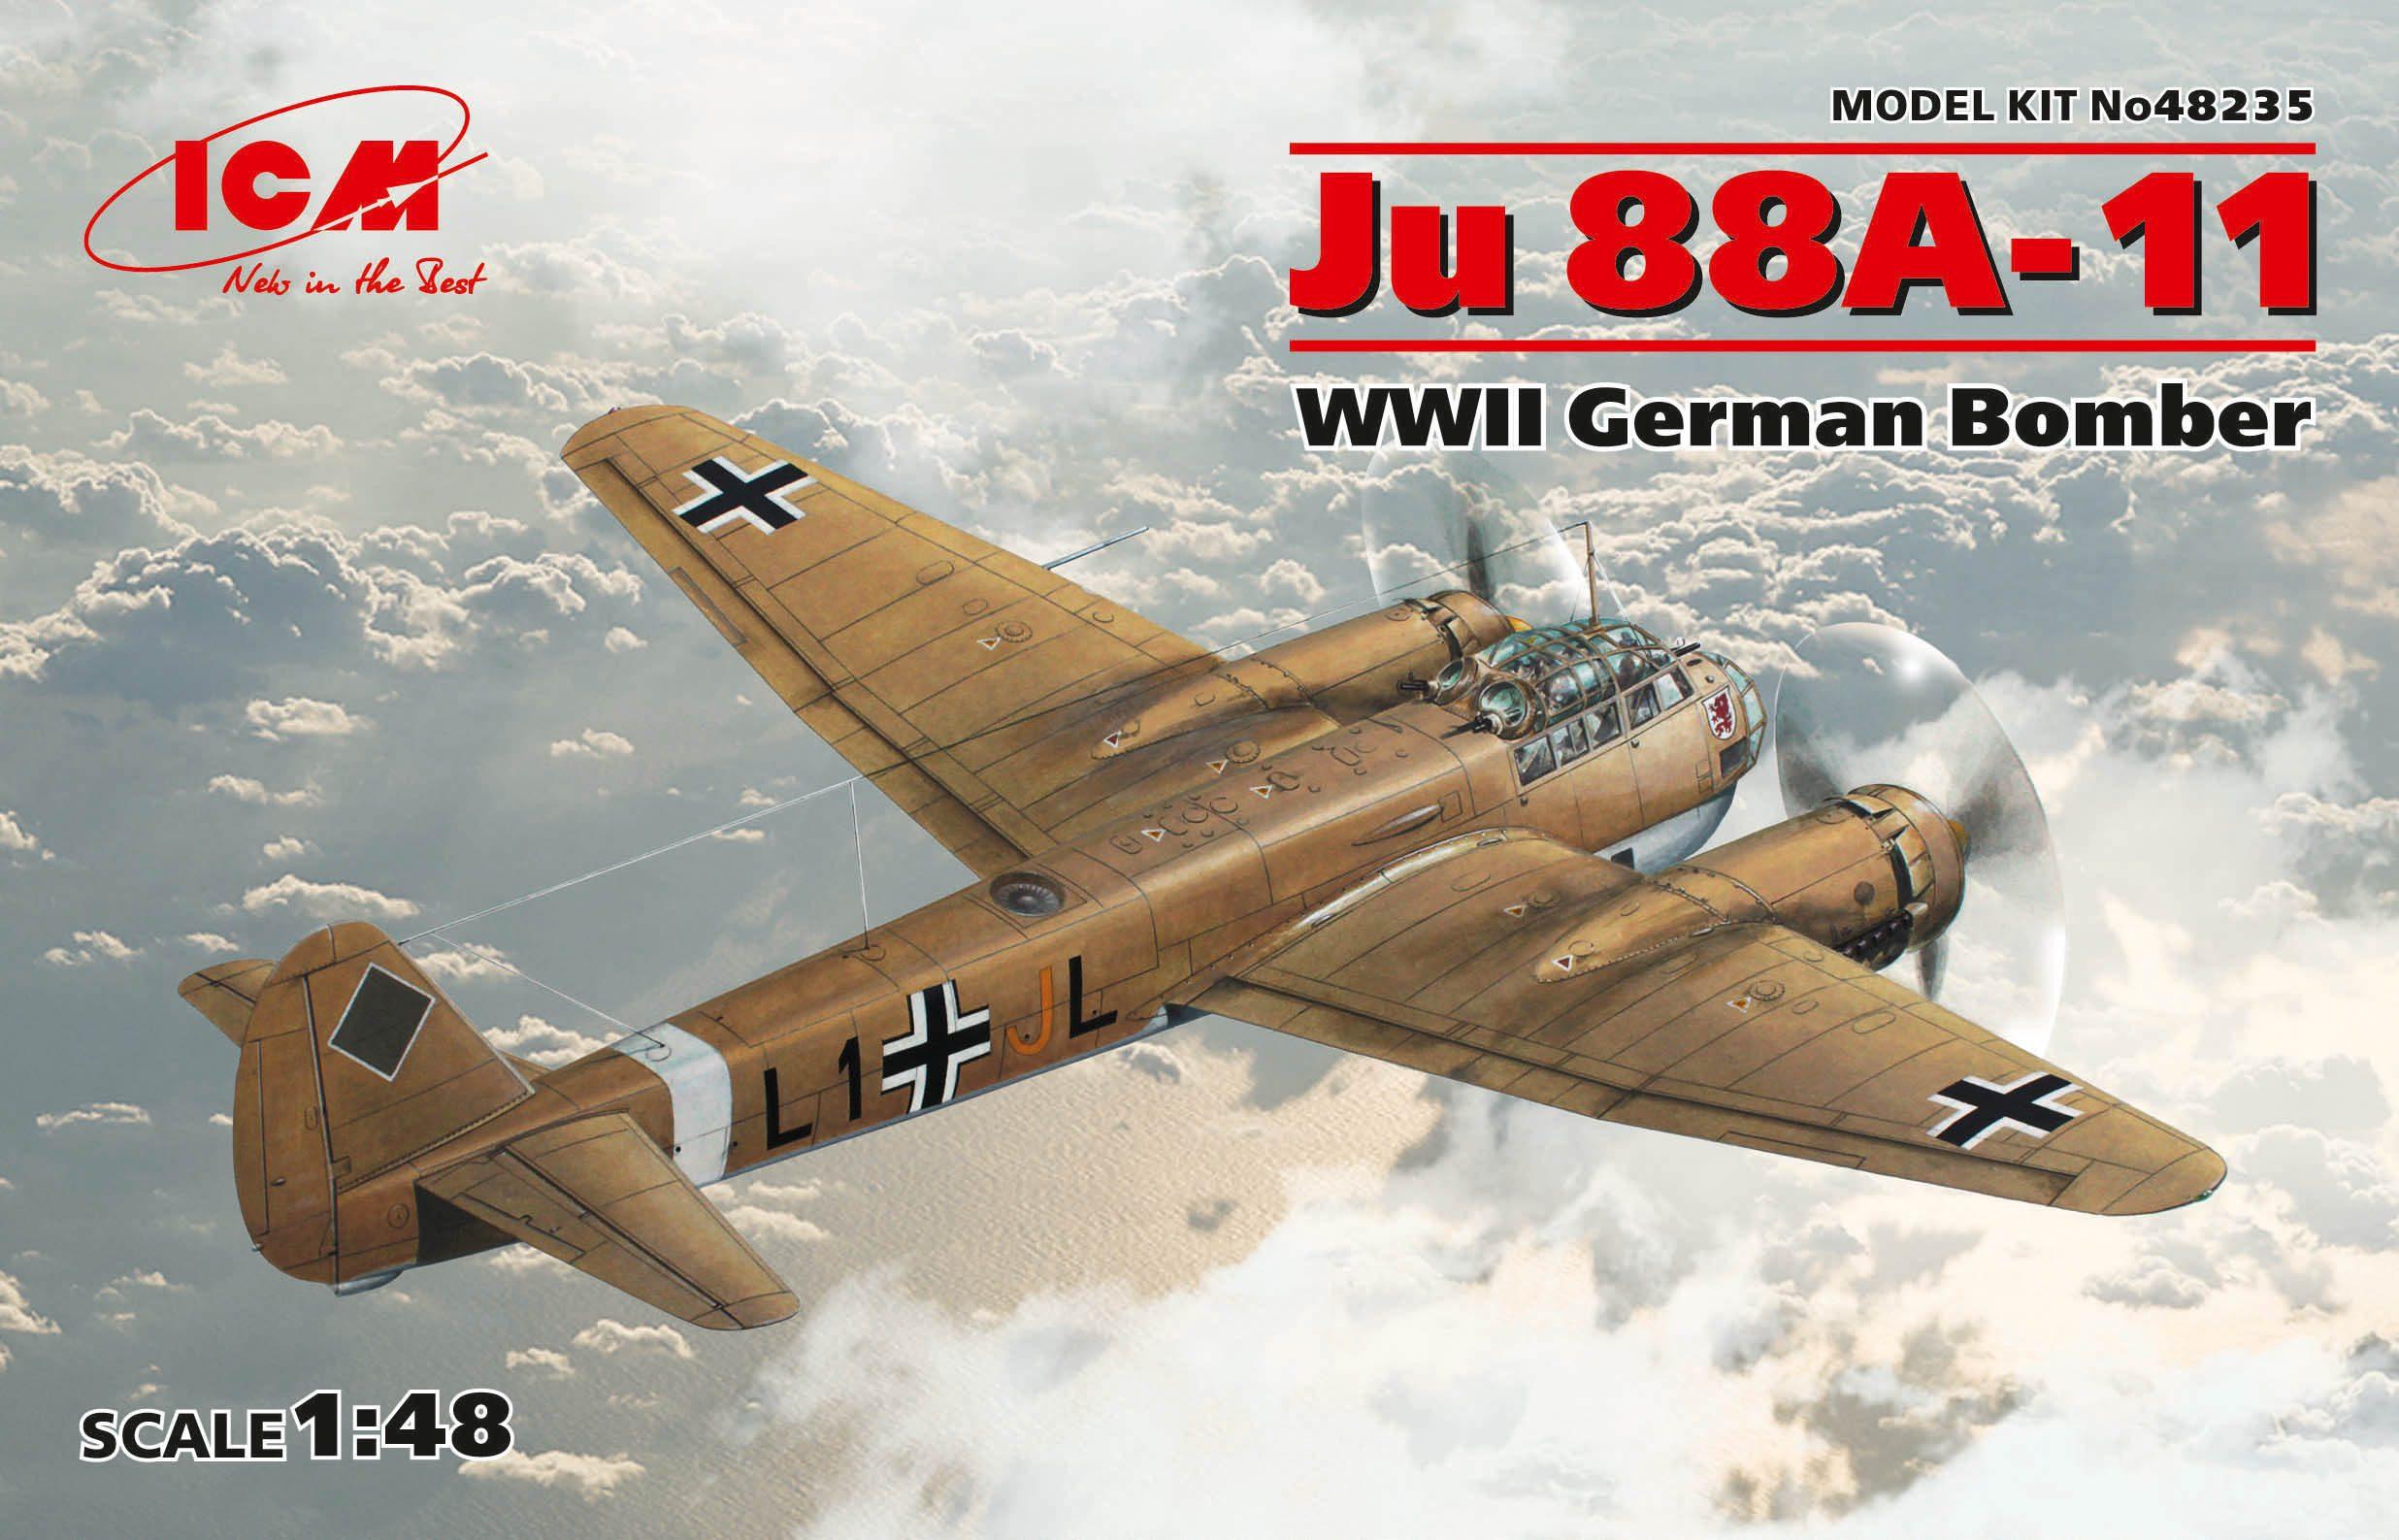 ICM Ju 88A-11, WWII German Bomber